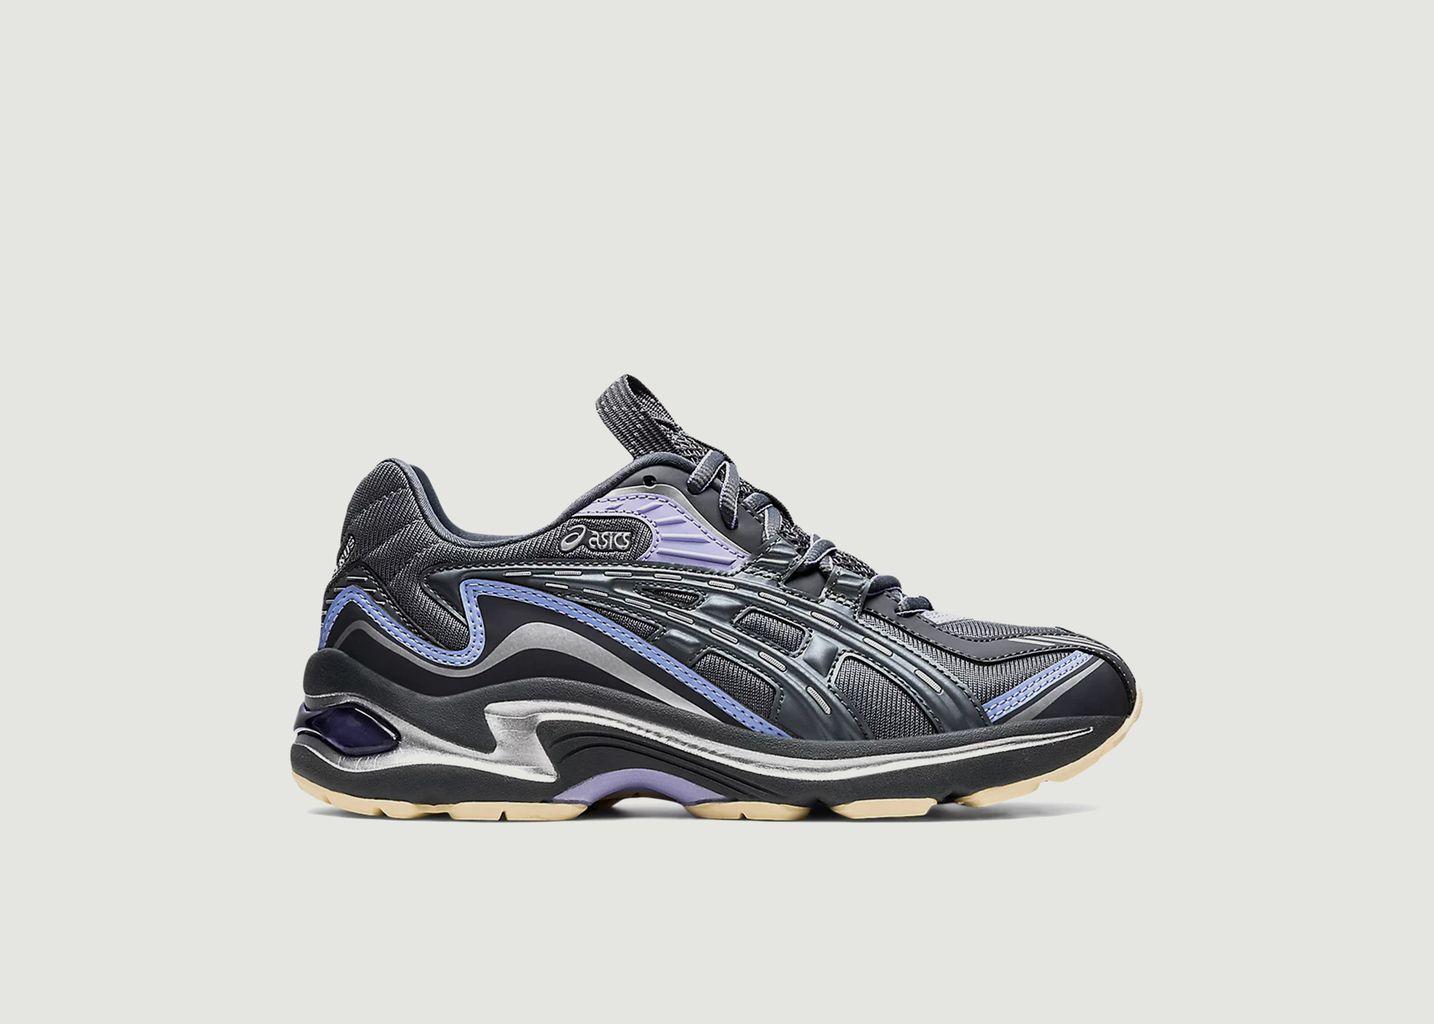 Sneakers FB1-S GEL PRELEUS  - Asics